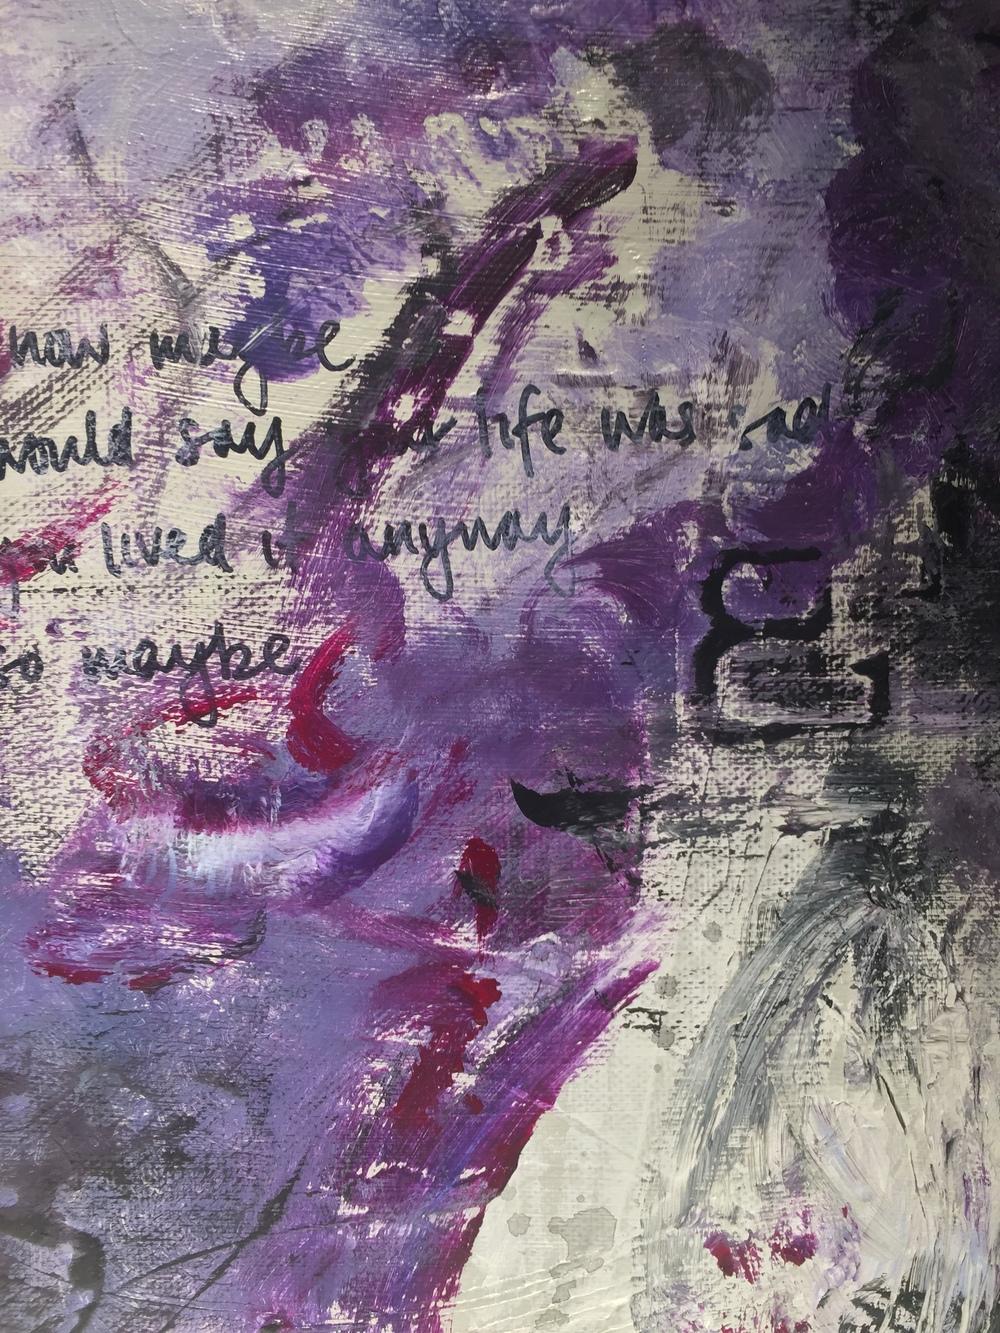 Lyrics from  Far Behind by Candlebox